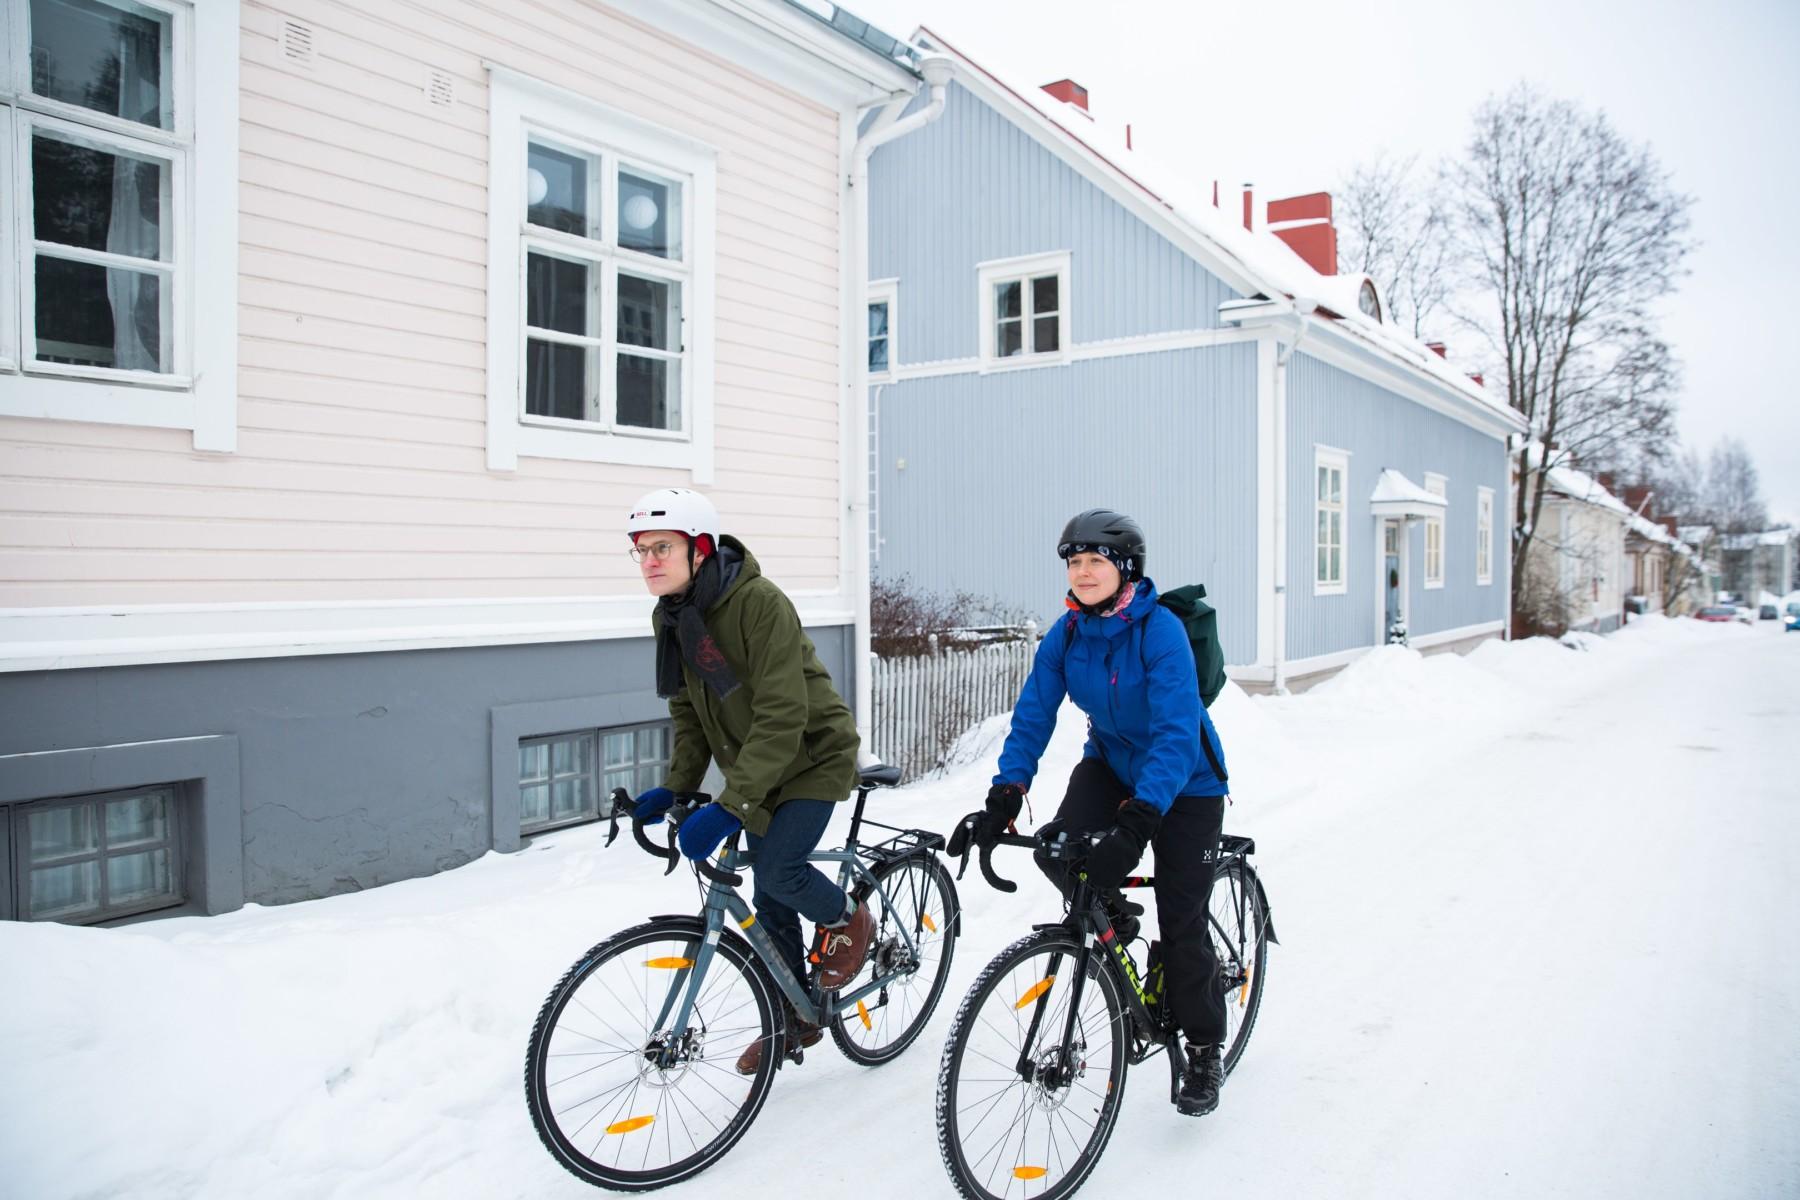 A man and a woman bike down a snowy street.